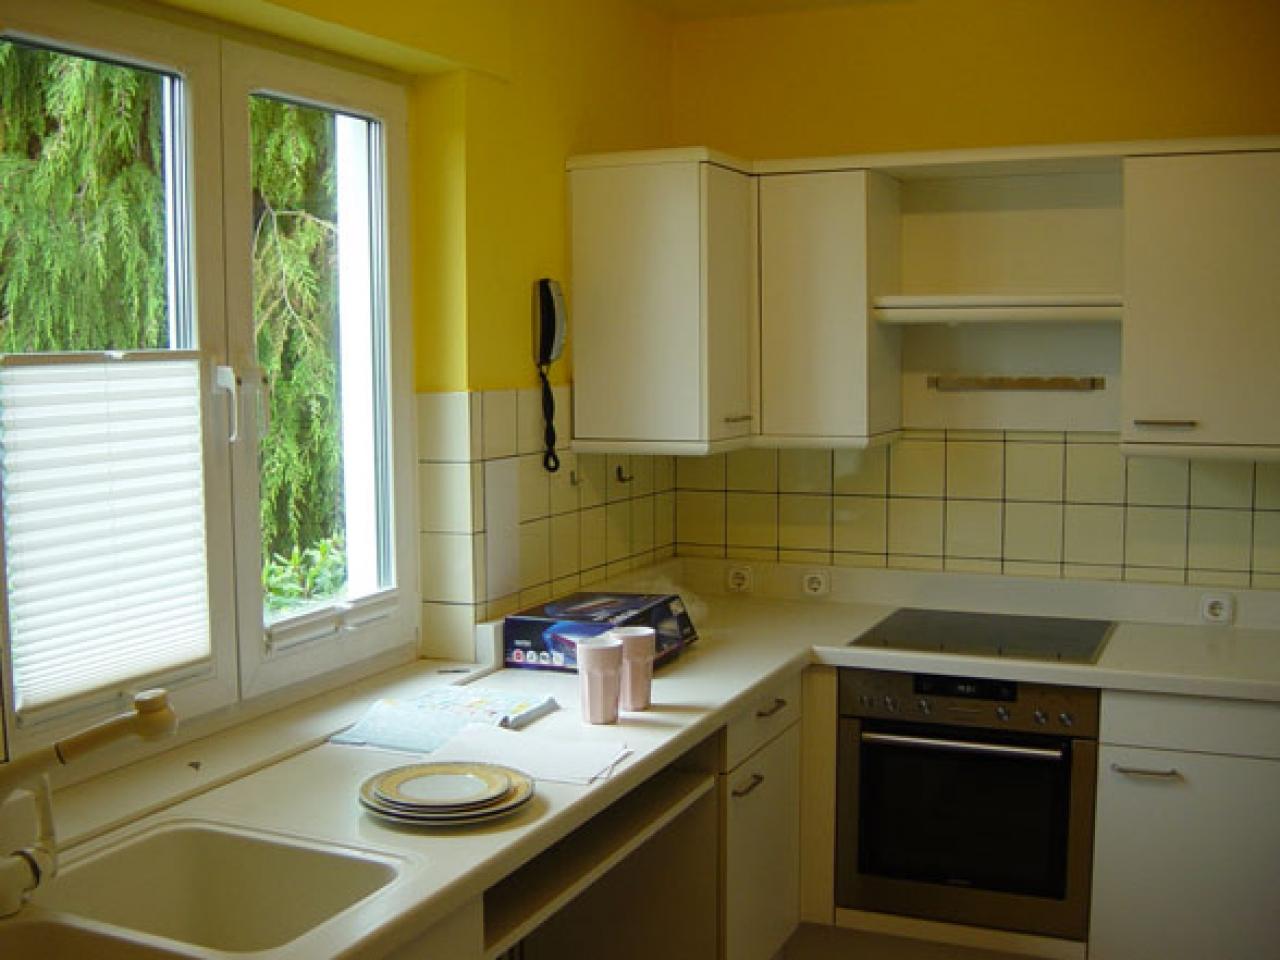 kitchen cabinet space ideas photo - 5